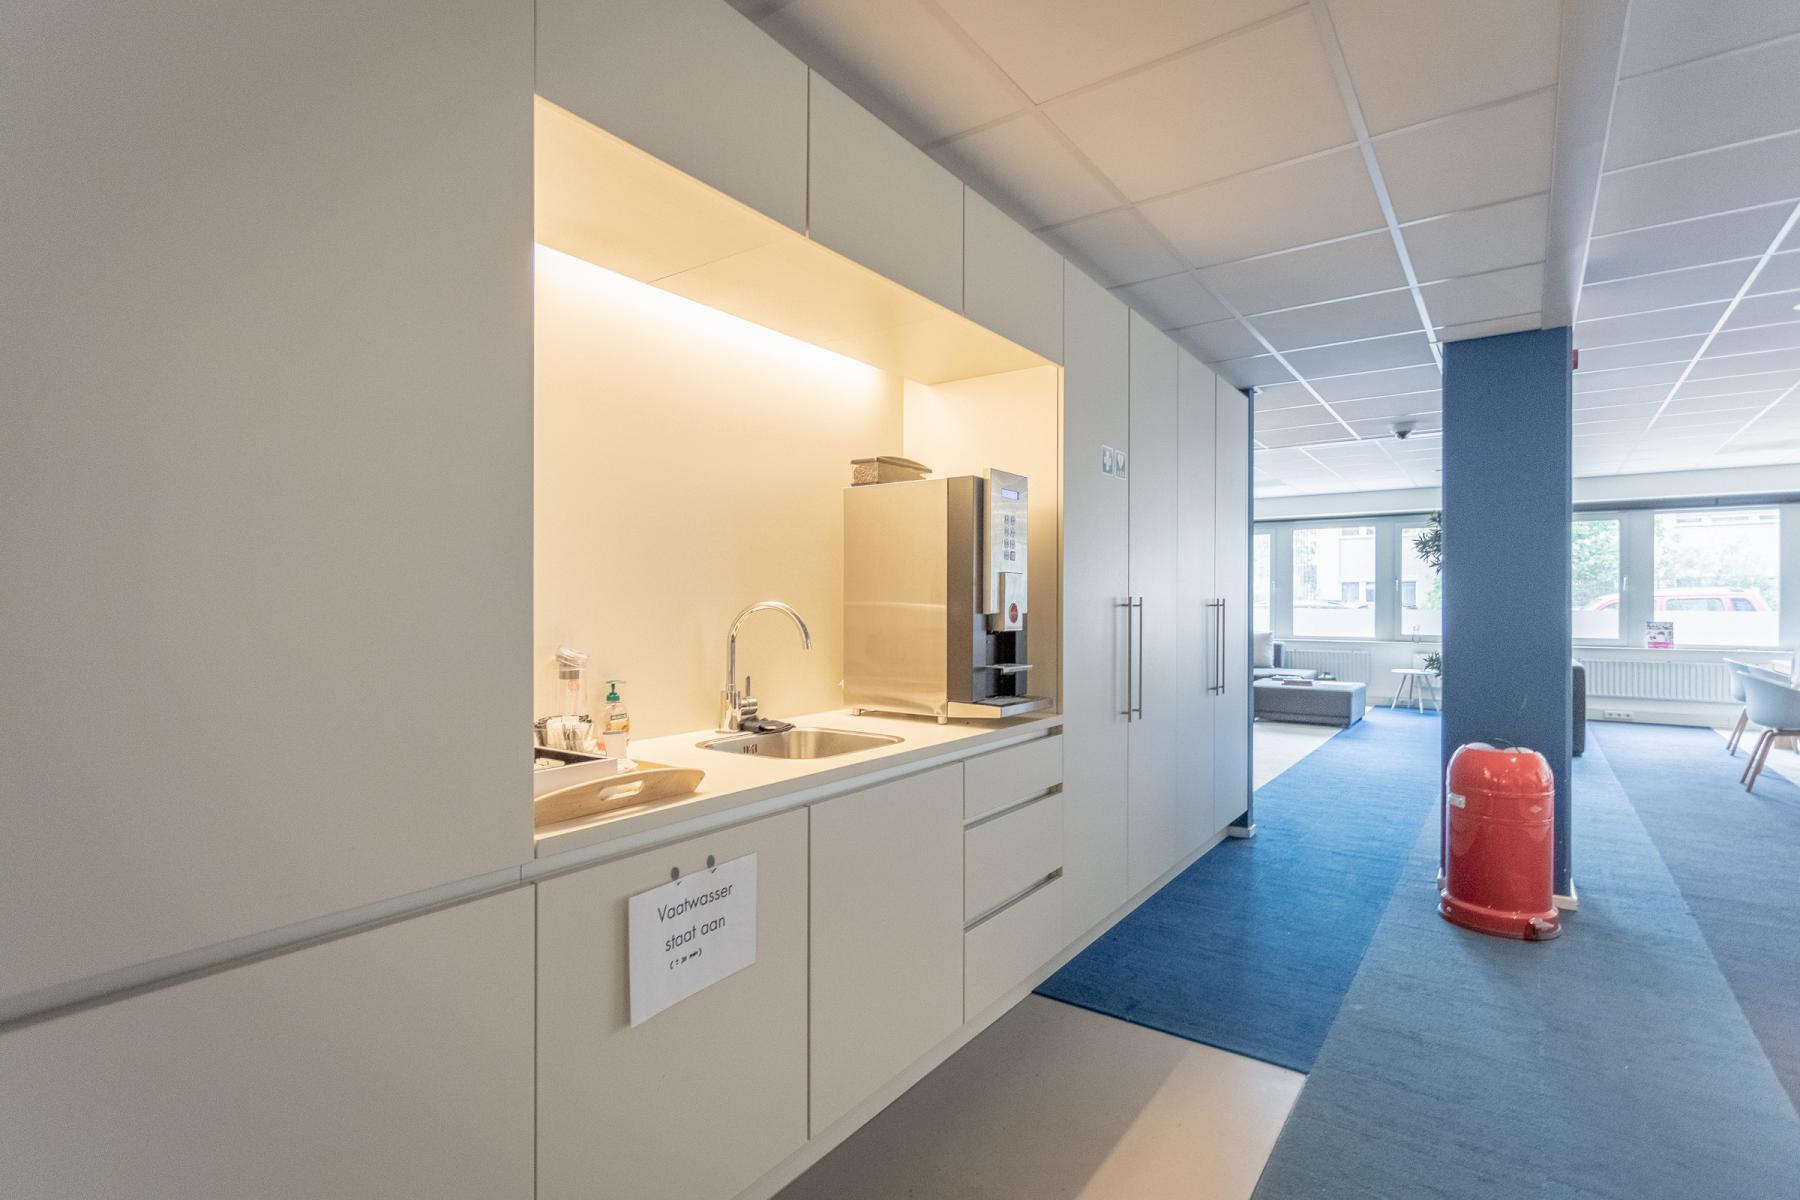 Rent office space Dokter Stolteweg 42, Zwolle (3)